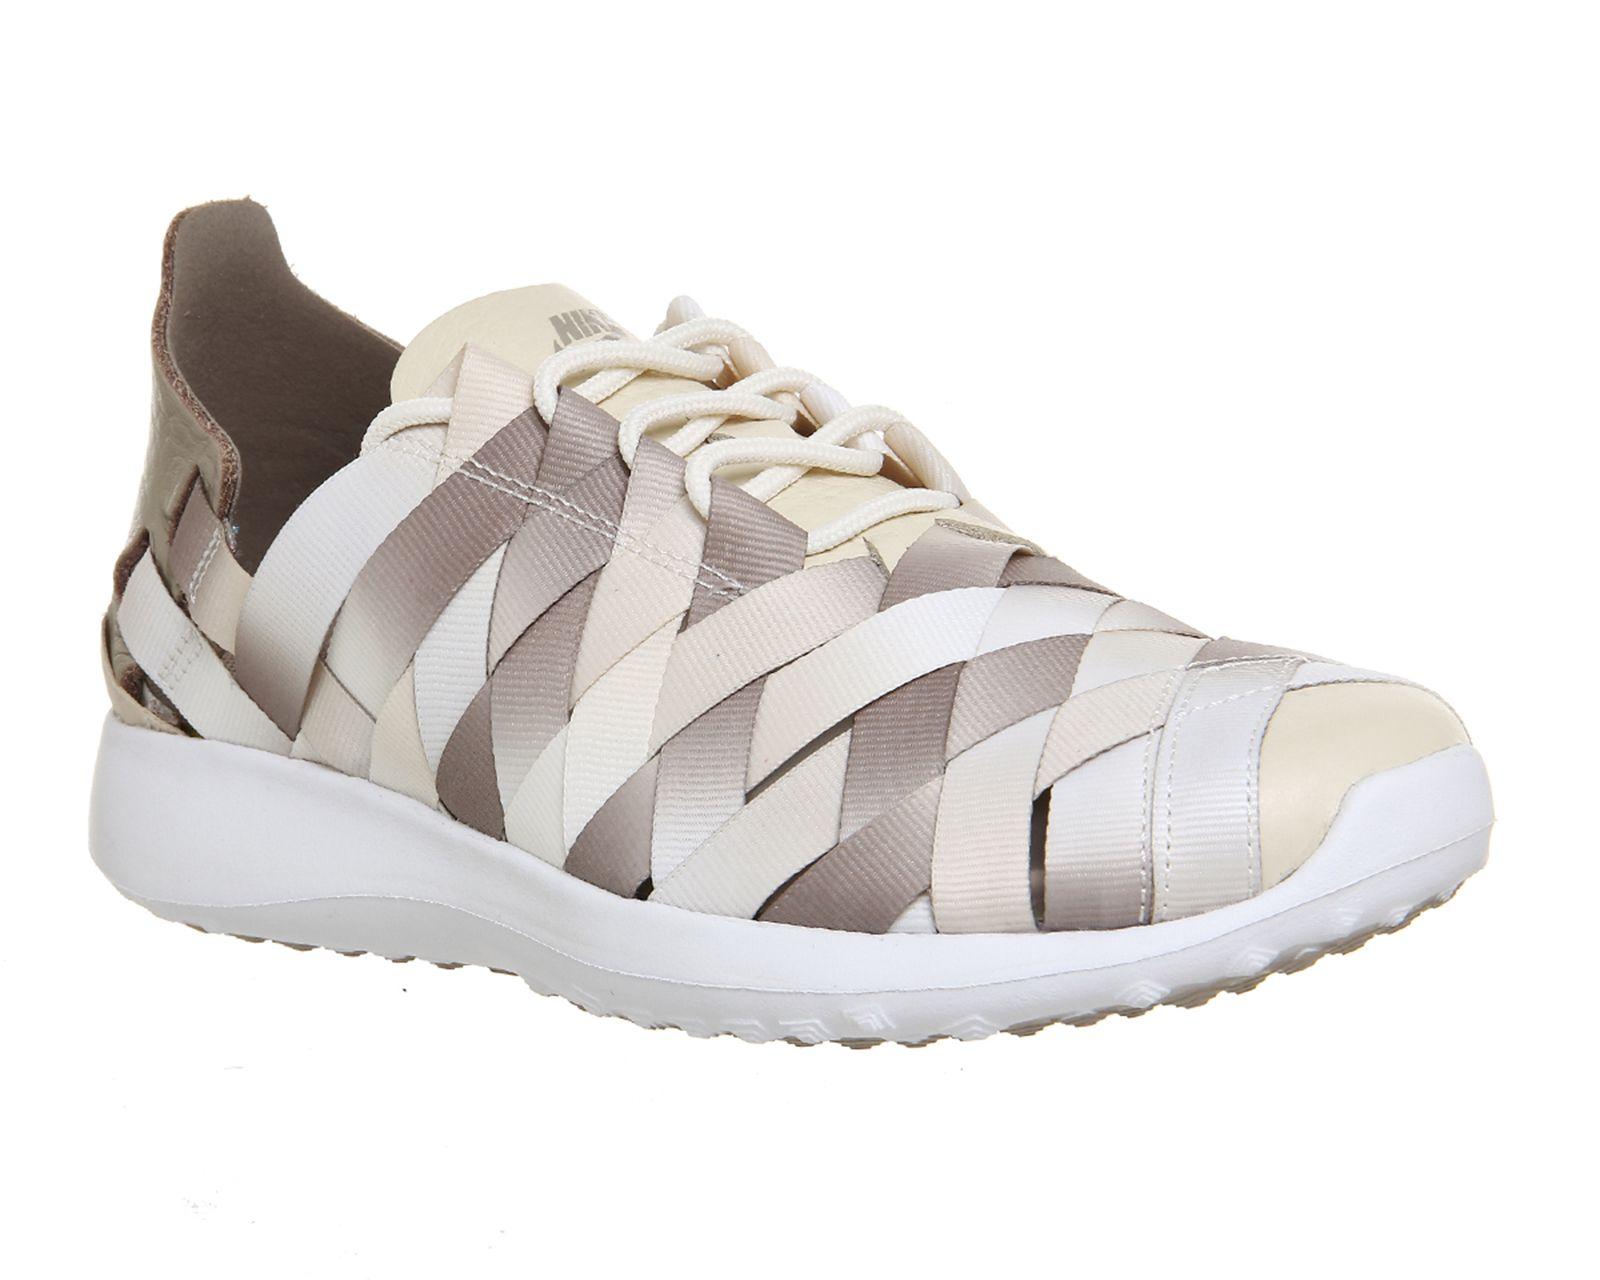 Woven from Phantom Pearl Nike W White Juvenate Buy Prm OPkZiXuT